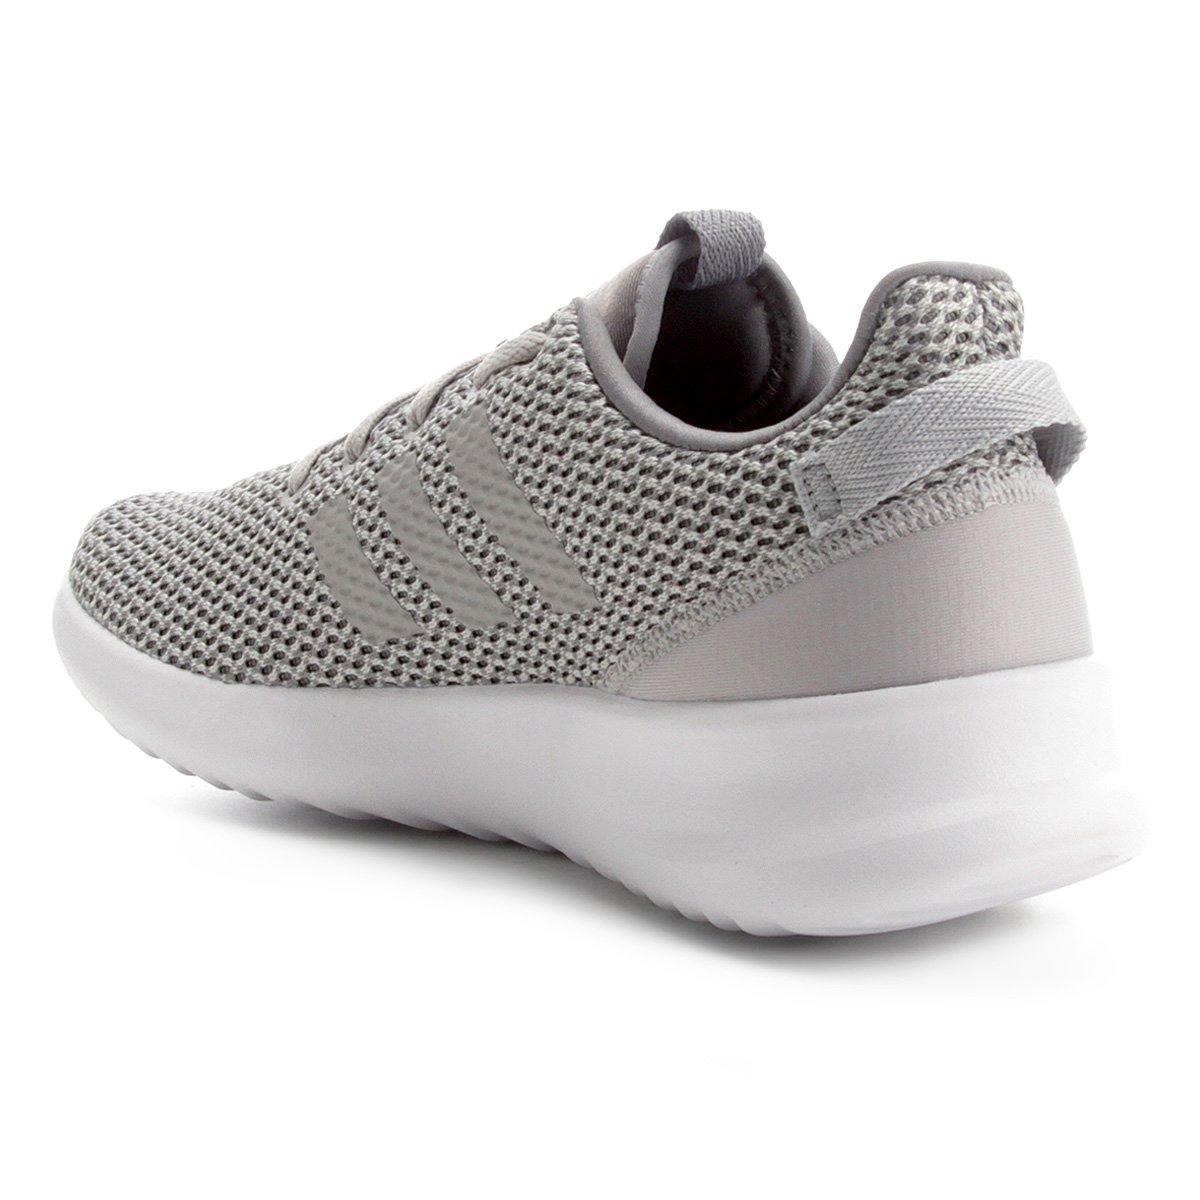 Tênis Adidas Cf Racer Tr Masculino - Mescla - Compre Agora  31e73f2f93cf0